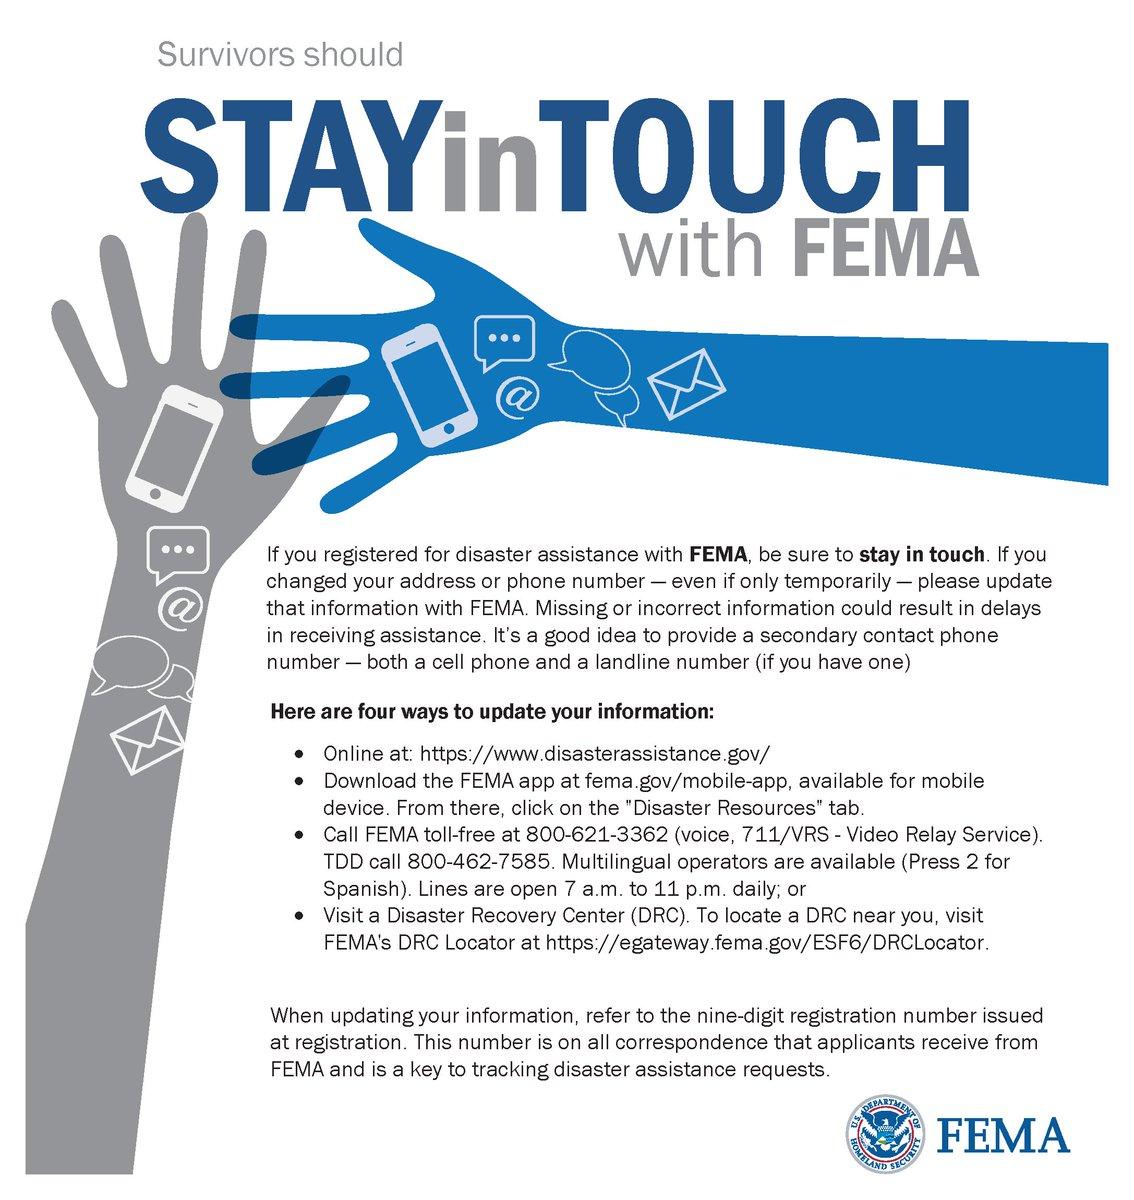 FEMA Region 6 on Twitter: